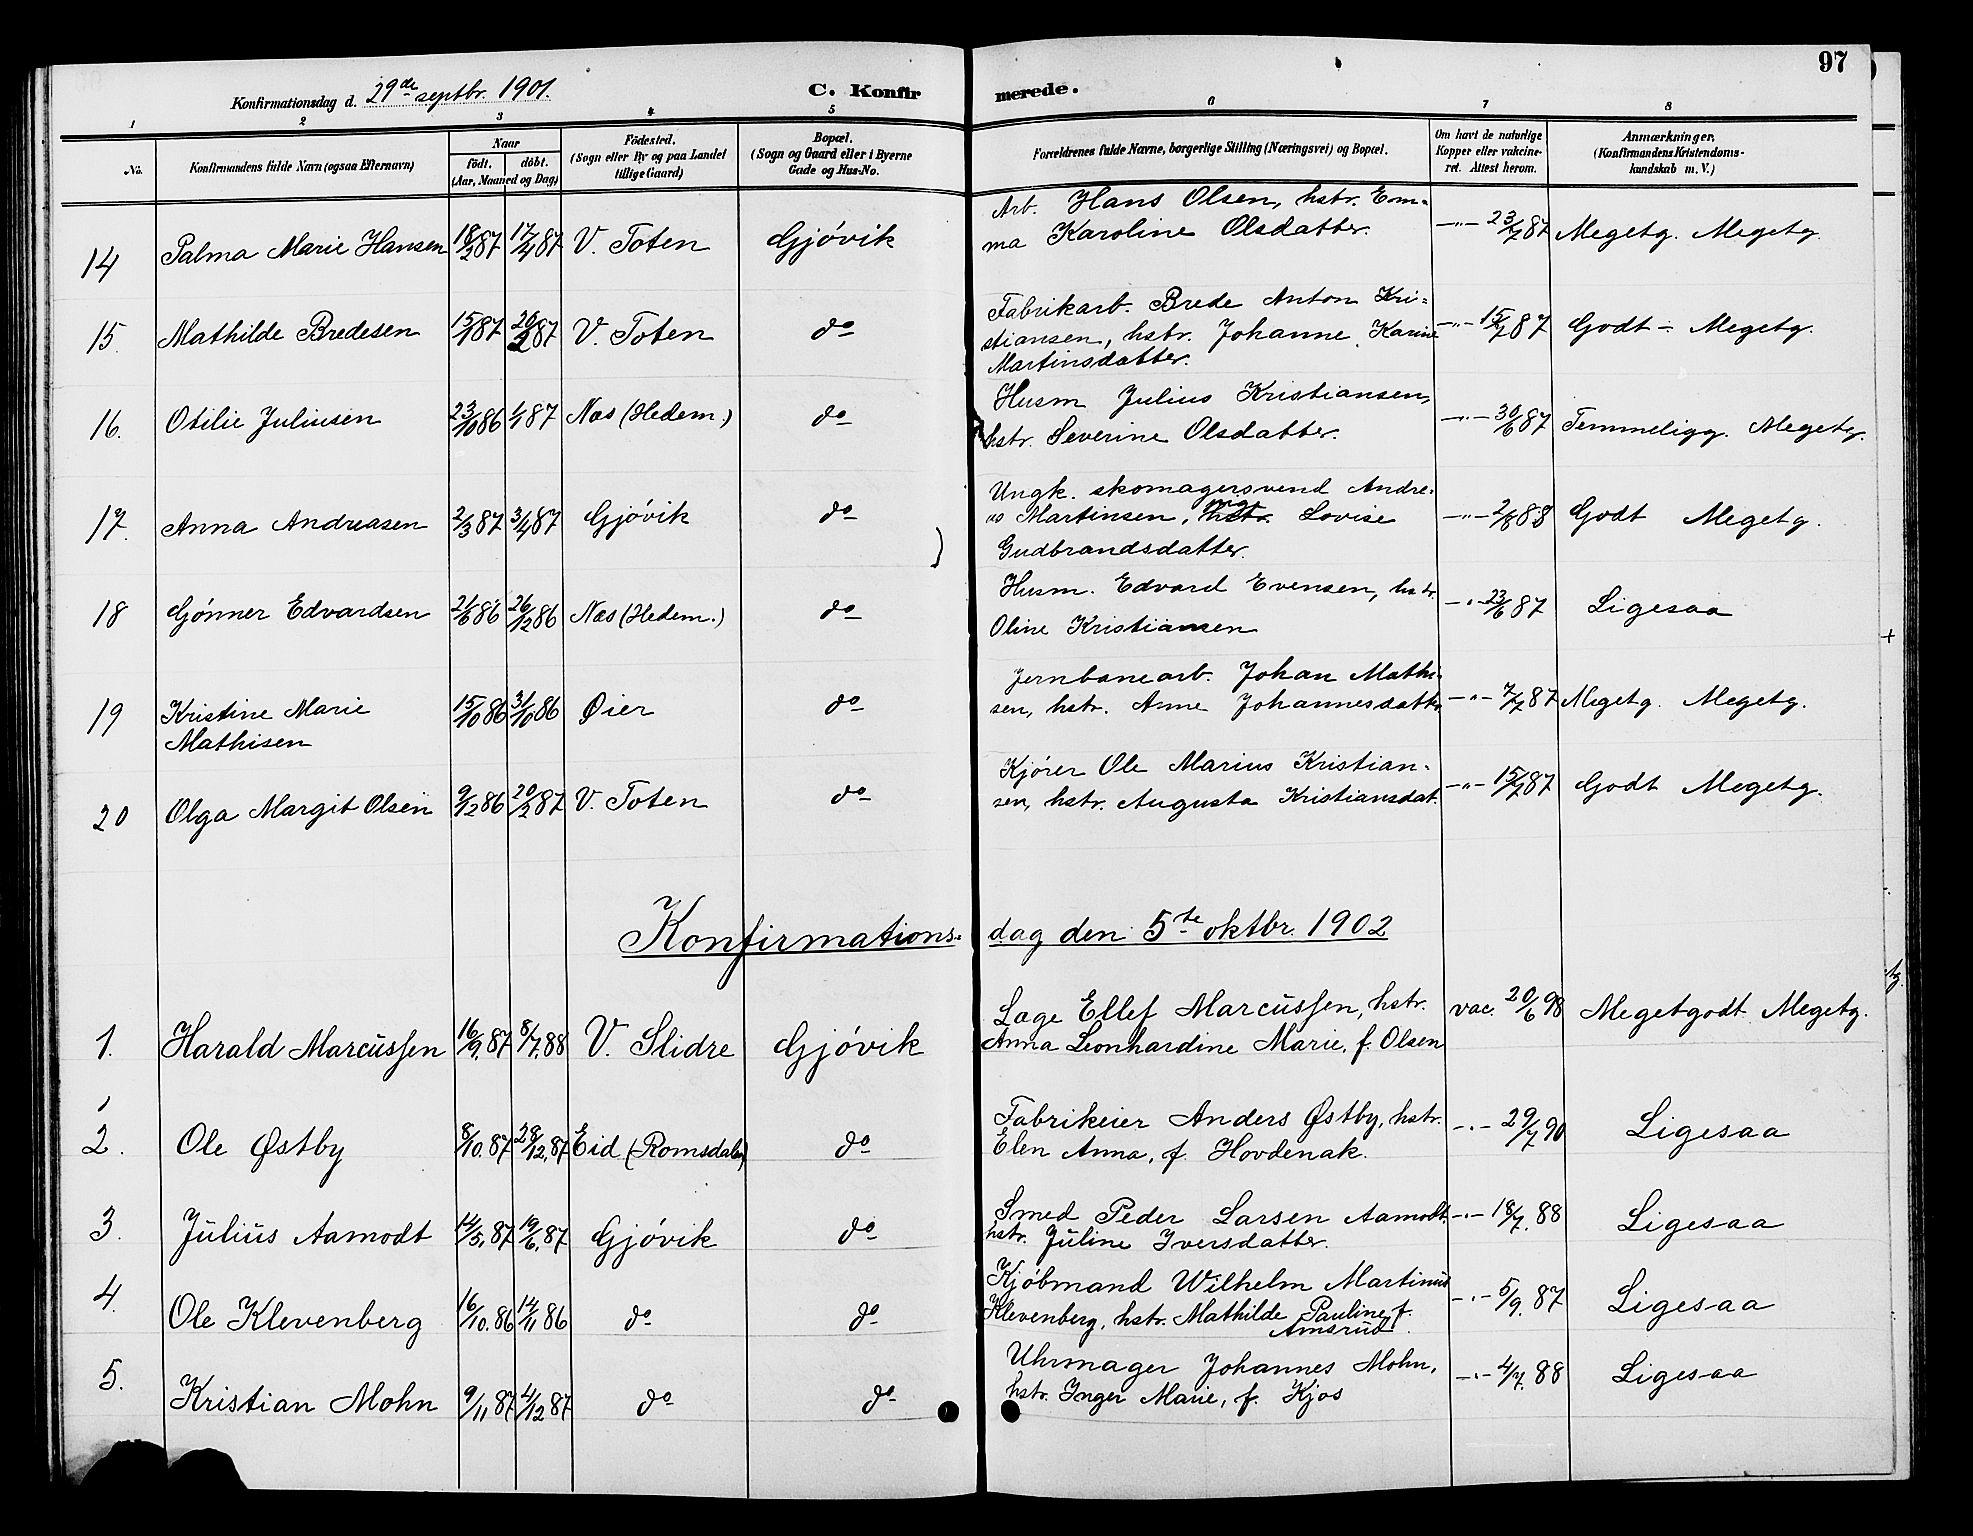 SAH, Vardal prestekontor, H/Ha/Hab/L0009: Klokkerbok nr. 9, 1894-1902, s. 97